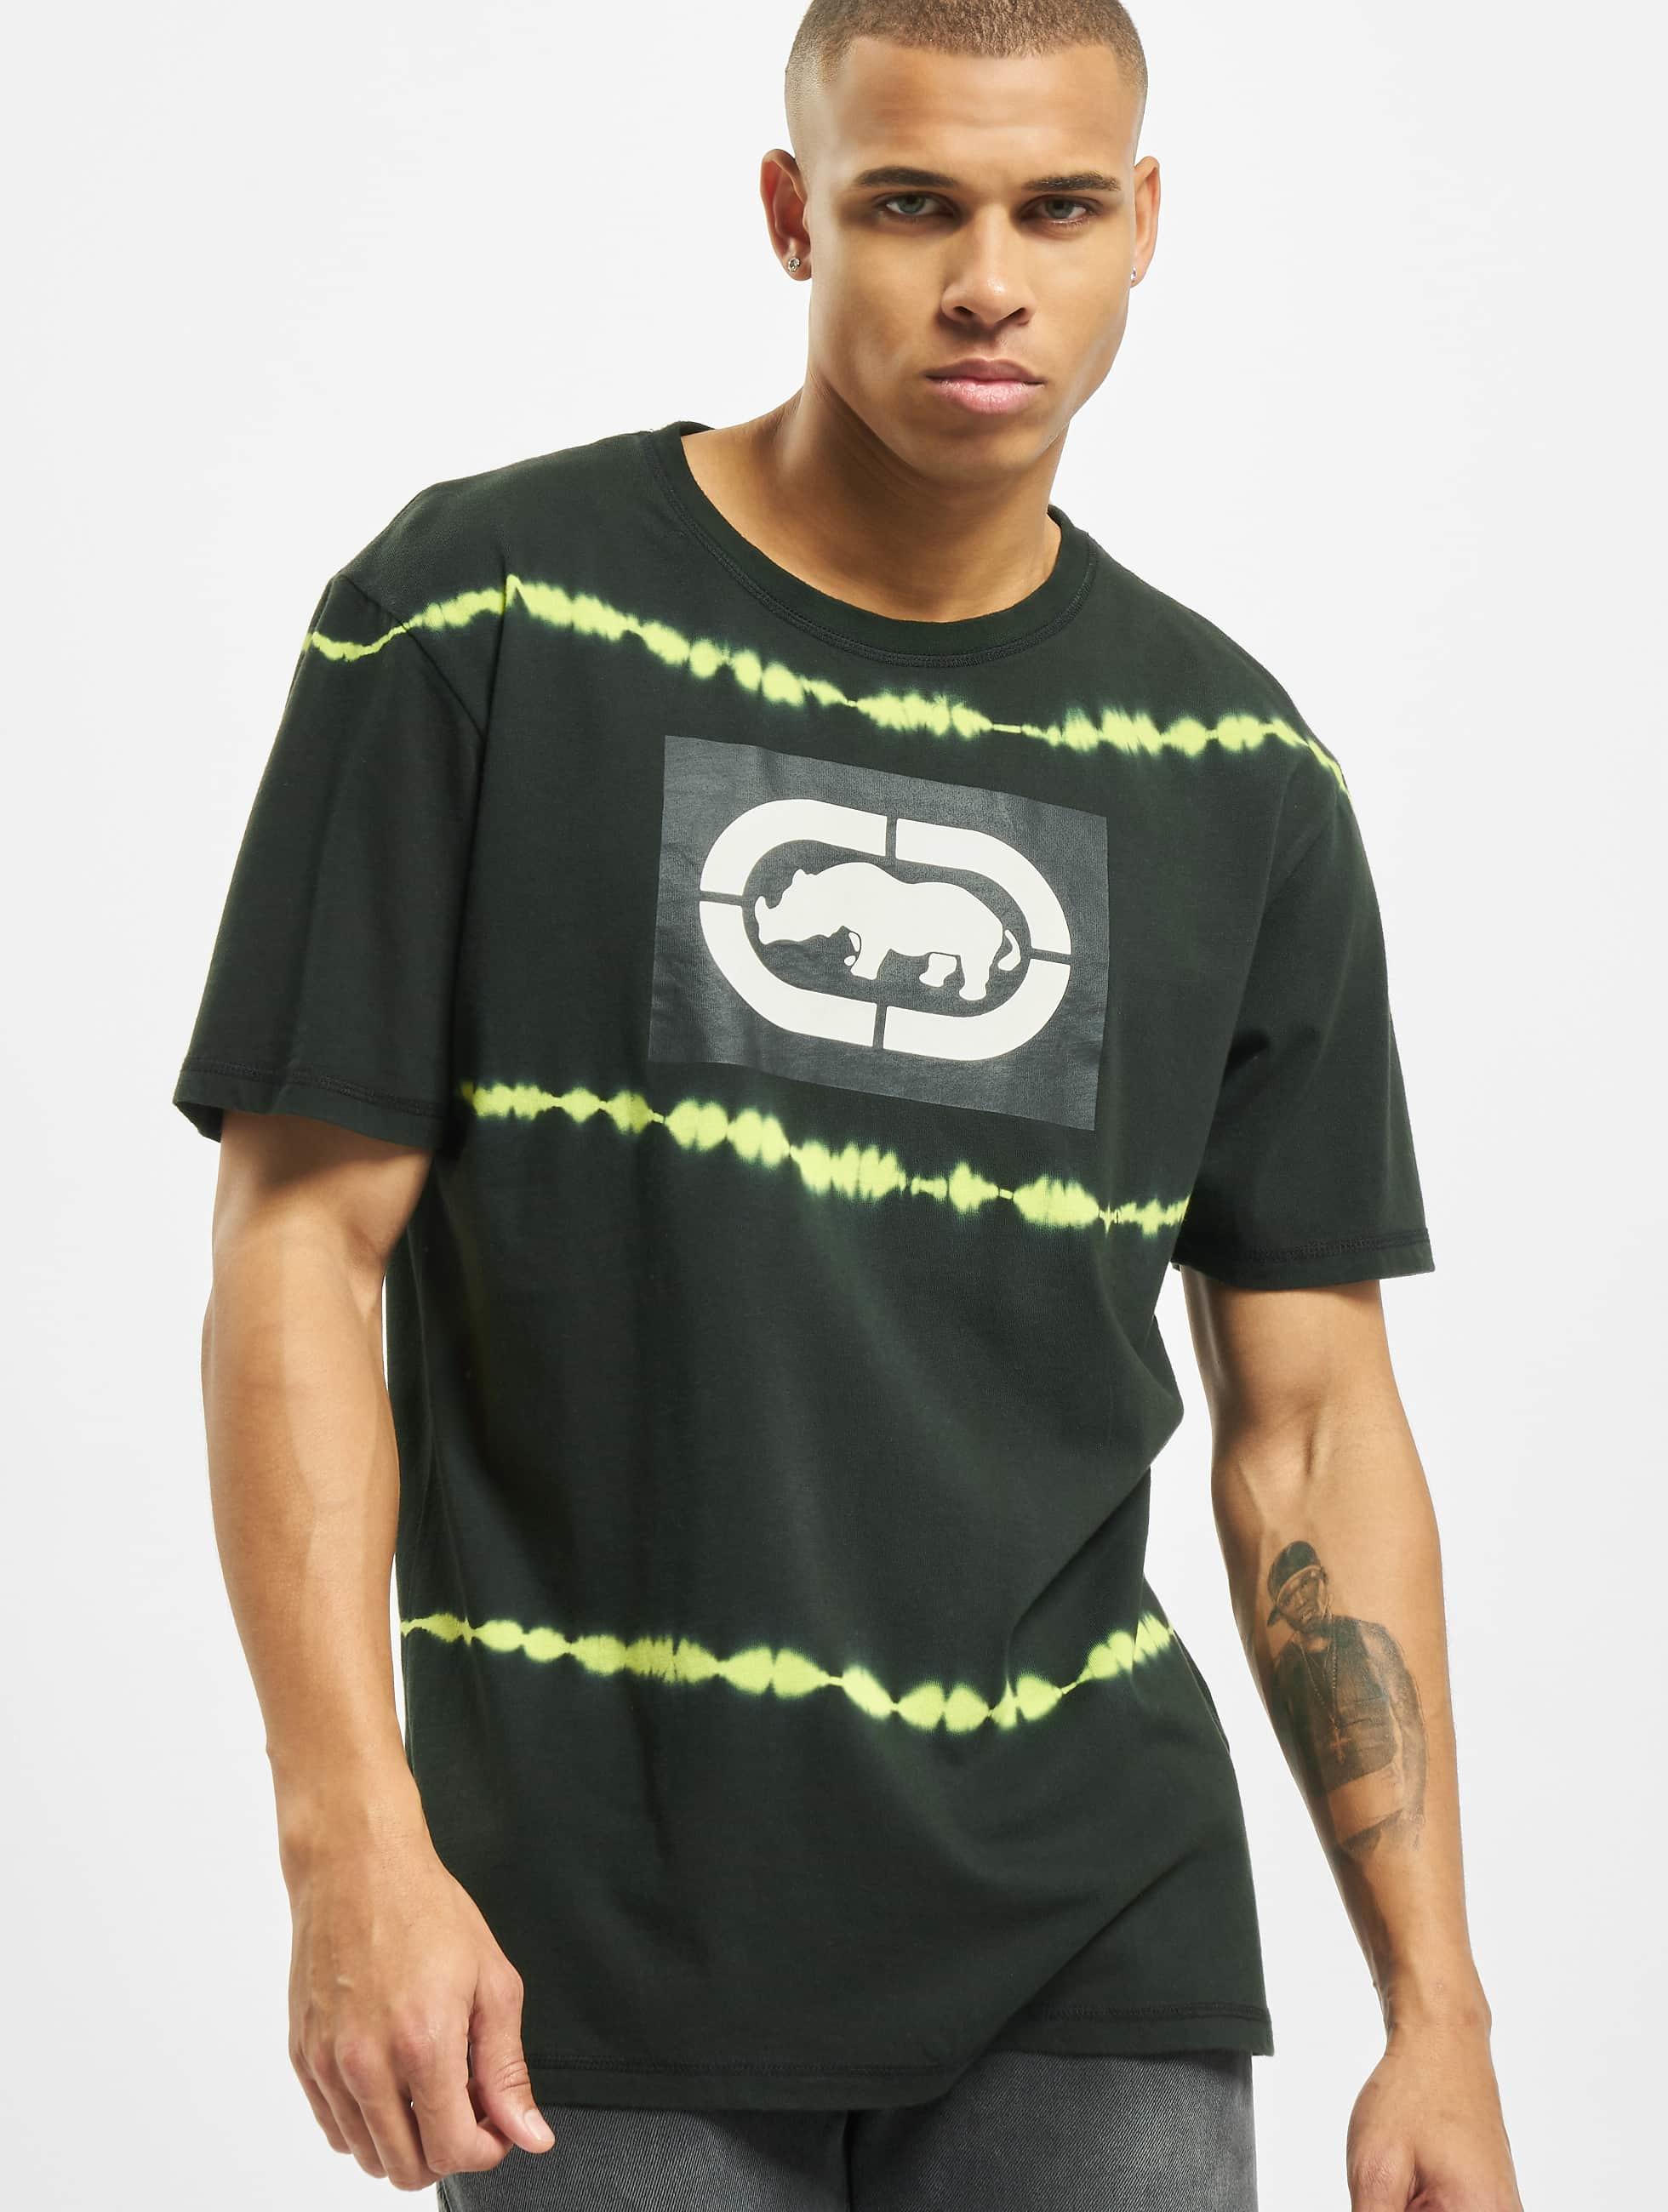 Ecko Unltd. / T-Shirt Swego in black XL